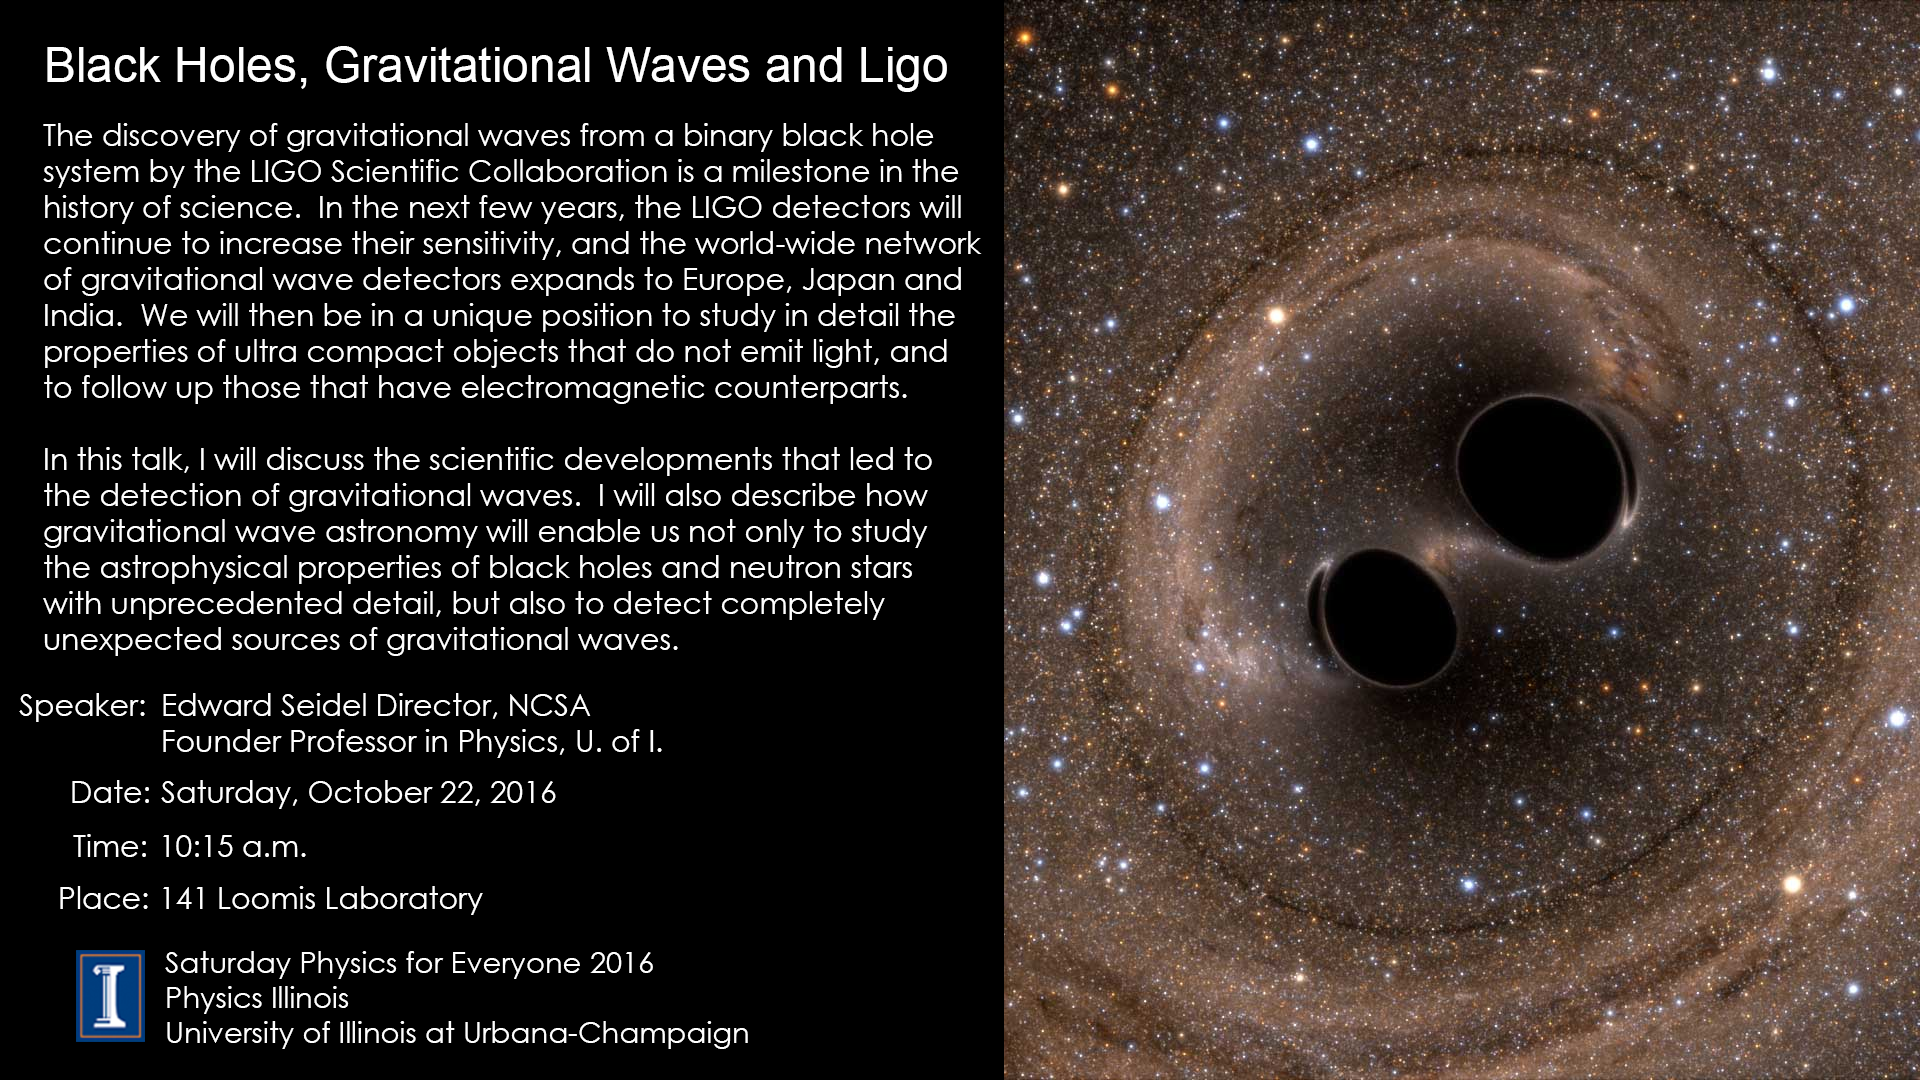 SPE slide for Black Holes, Gravitational Waves, and LIGO